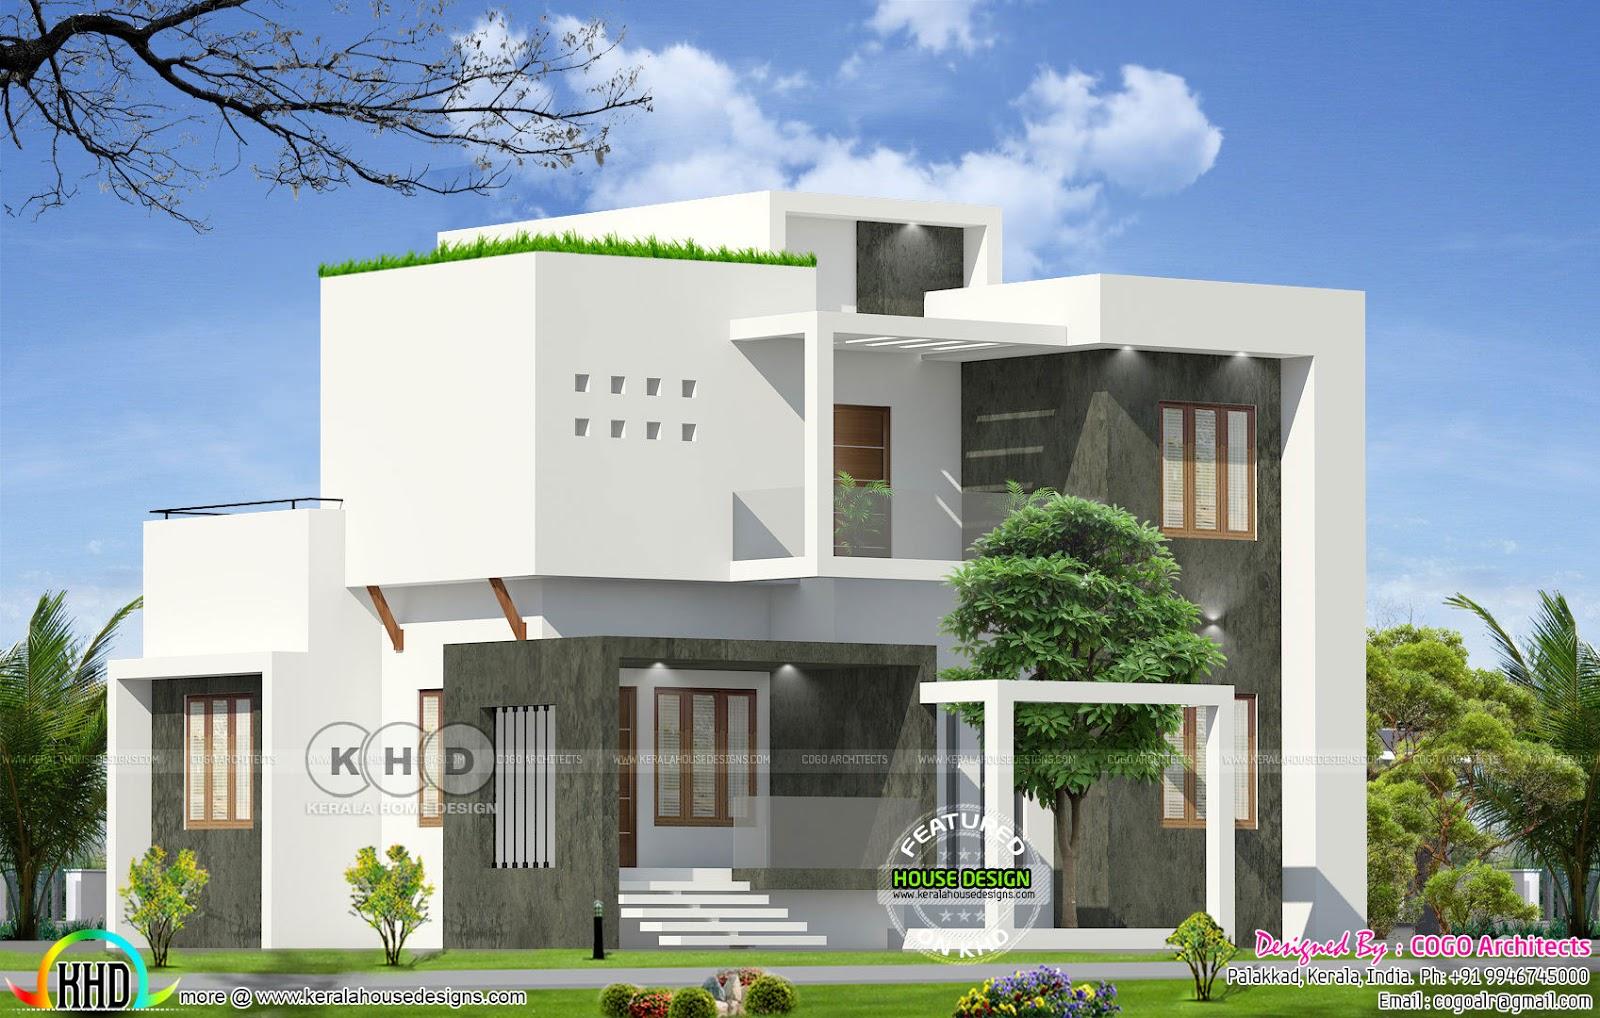 25 Lakhs Budget Contemporary Beautiful Home Kerala Home